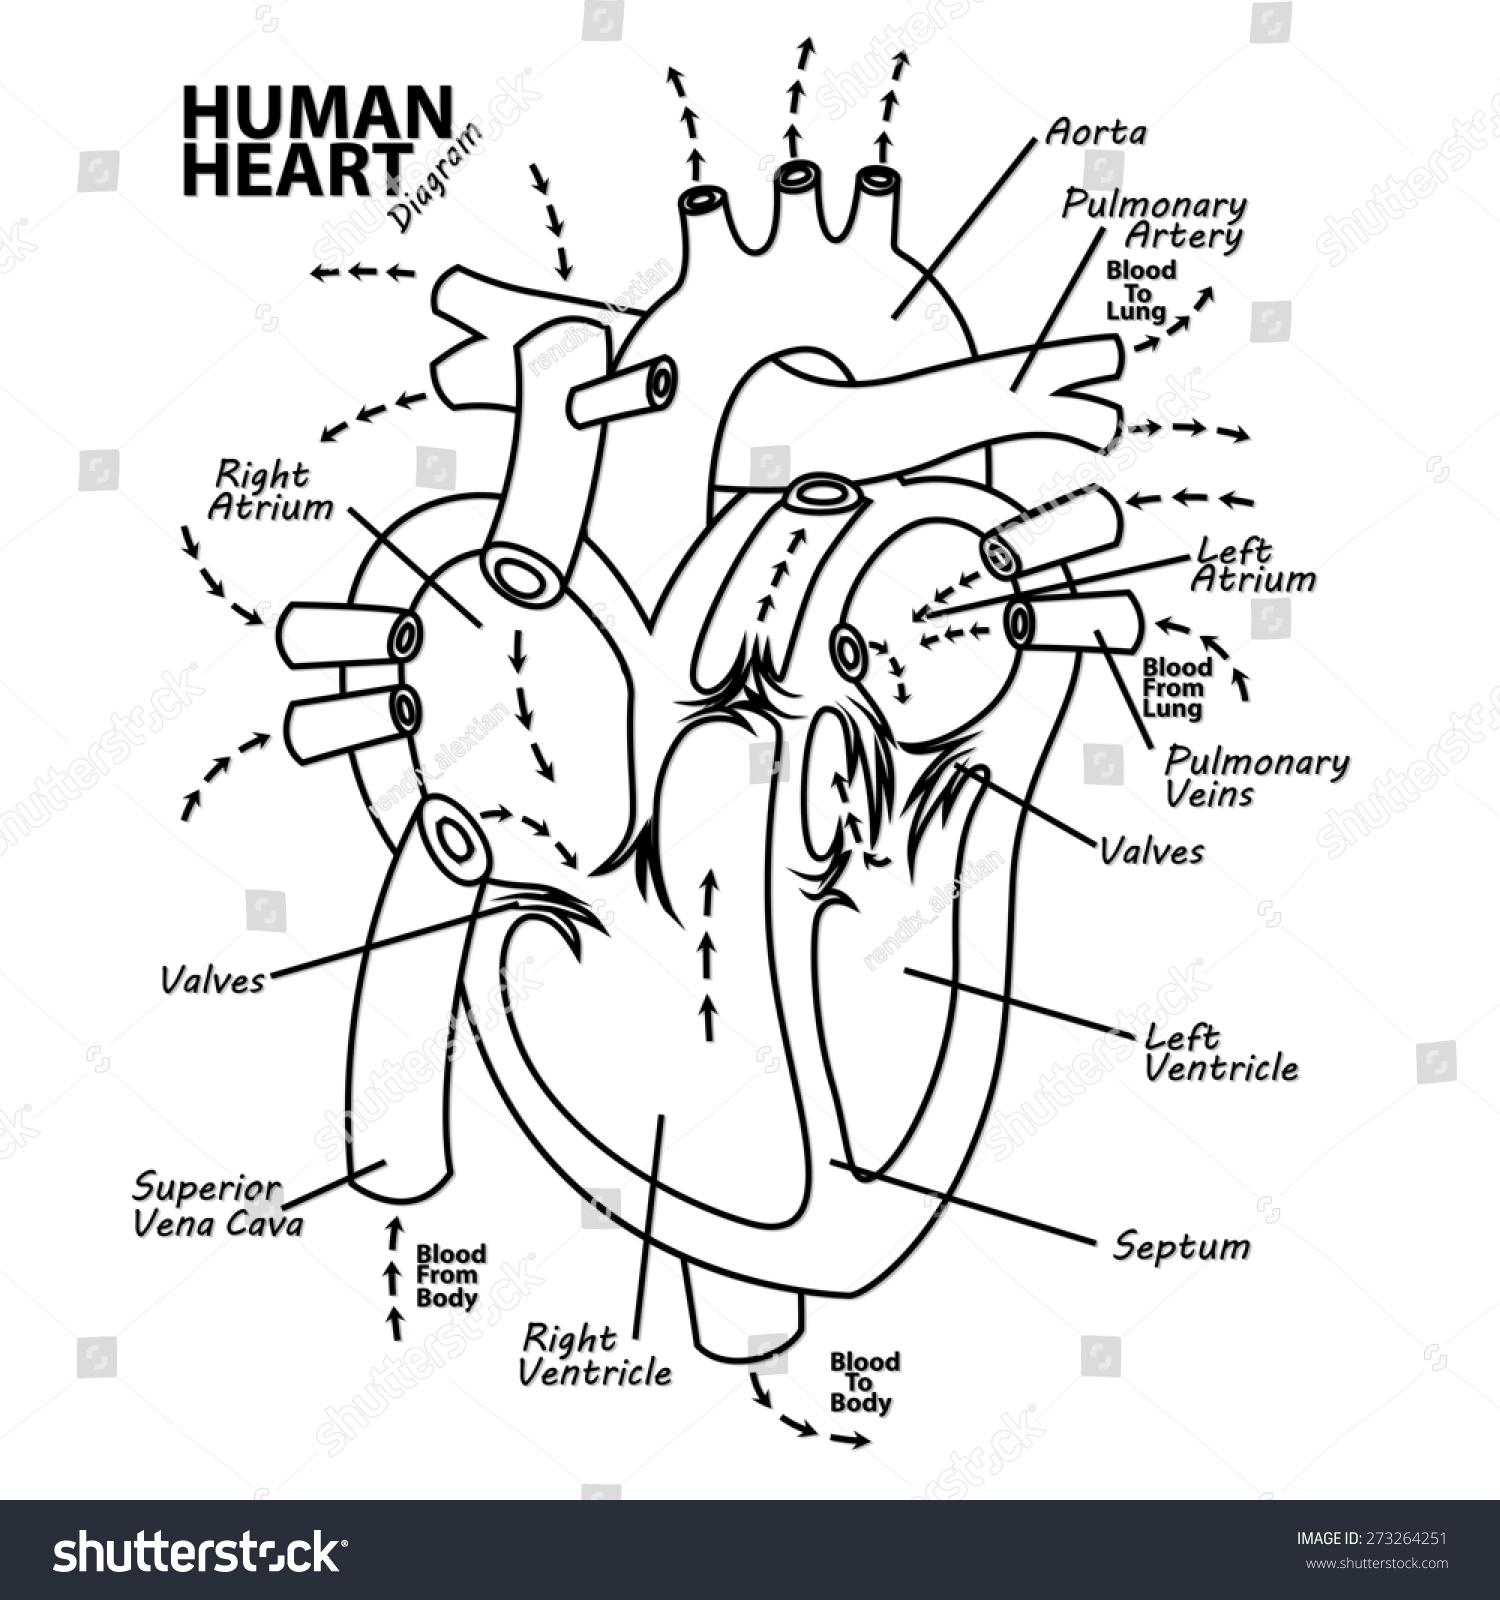 Human heart diagram anatomy stock illustration 273264251 human heart diagram anatomy pooptronica Image collections